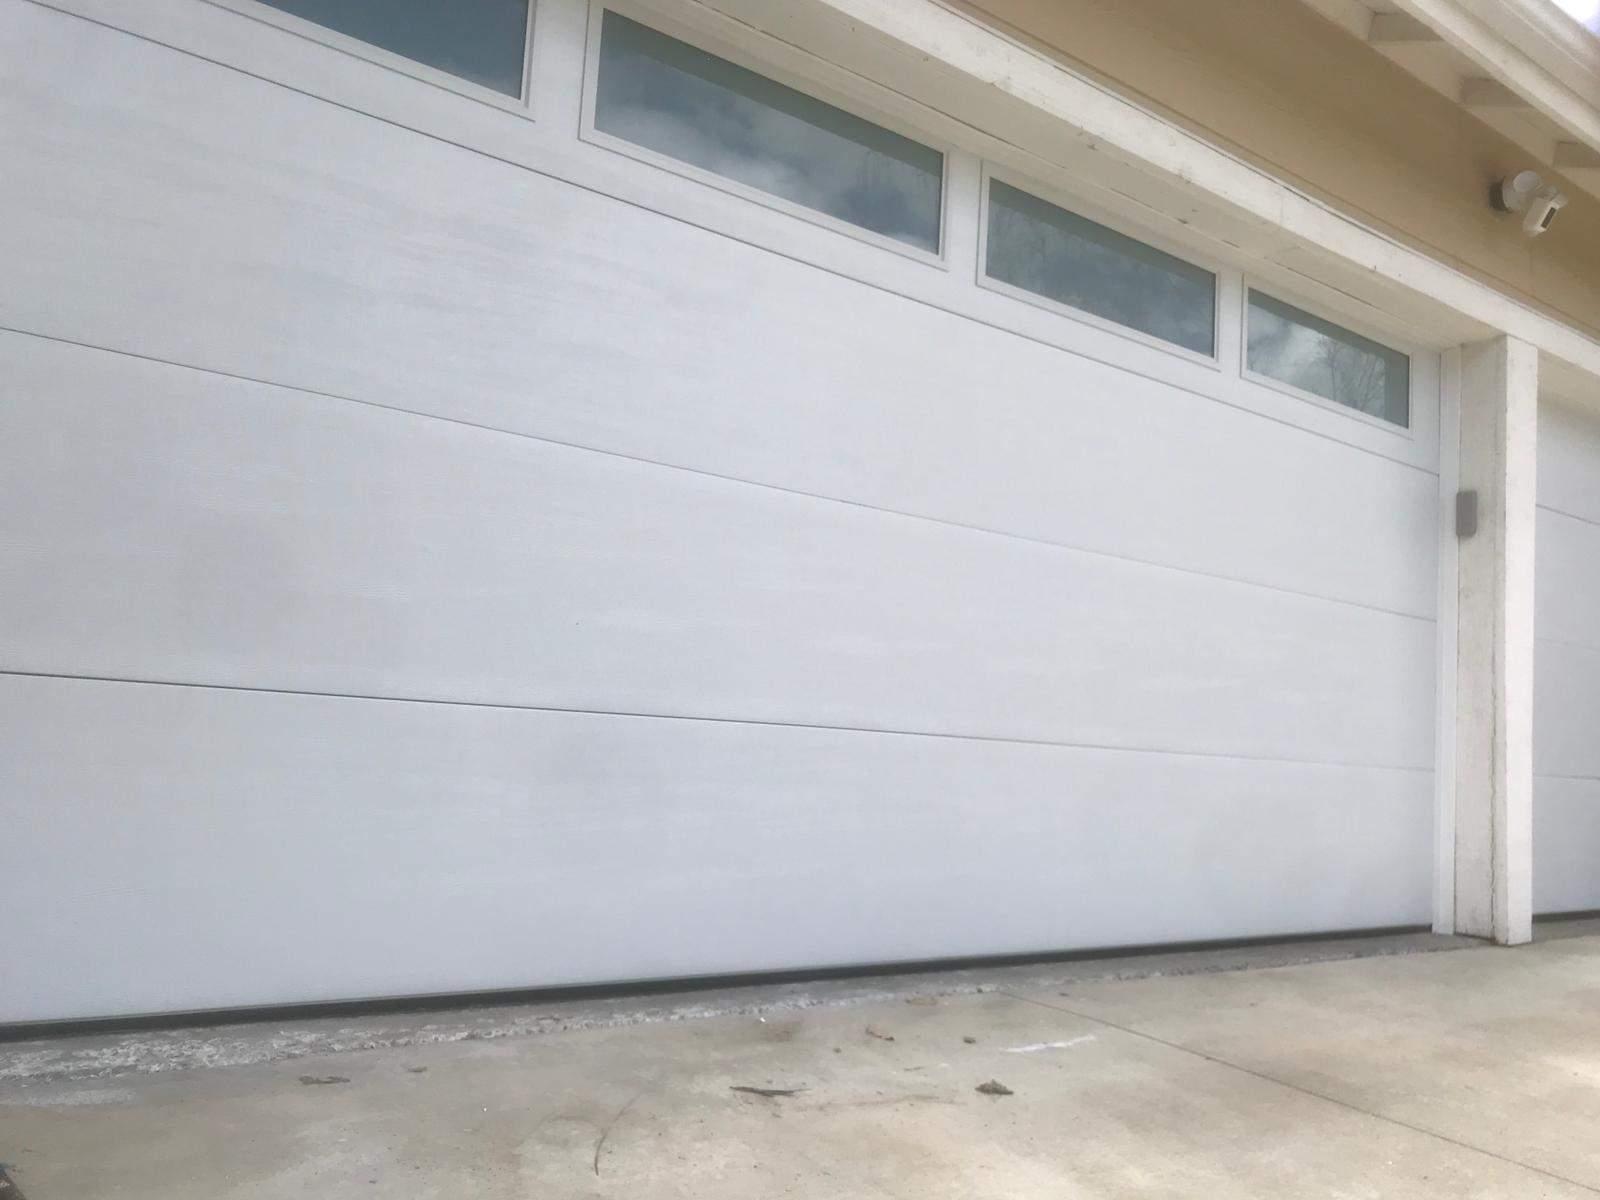 Saratoga CA Garage Door Repair & Replacement